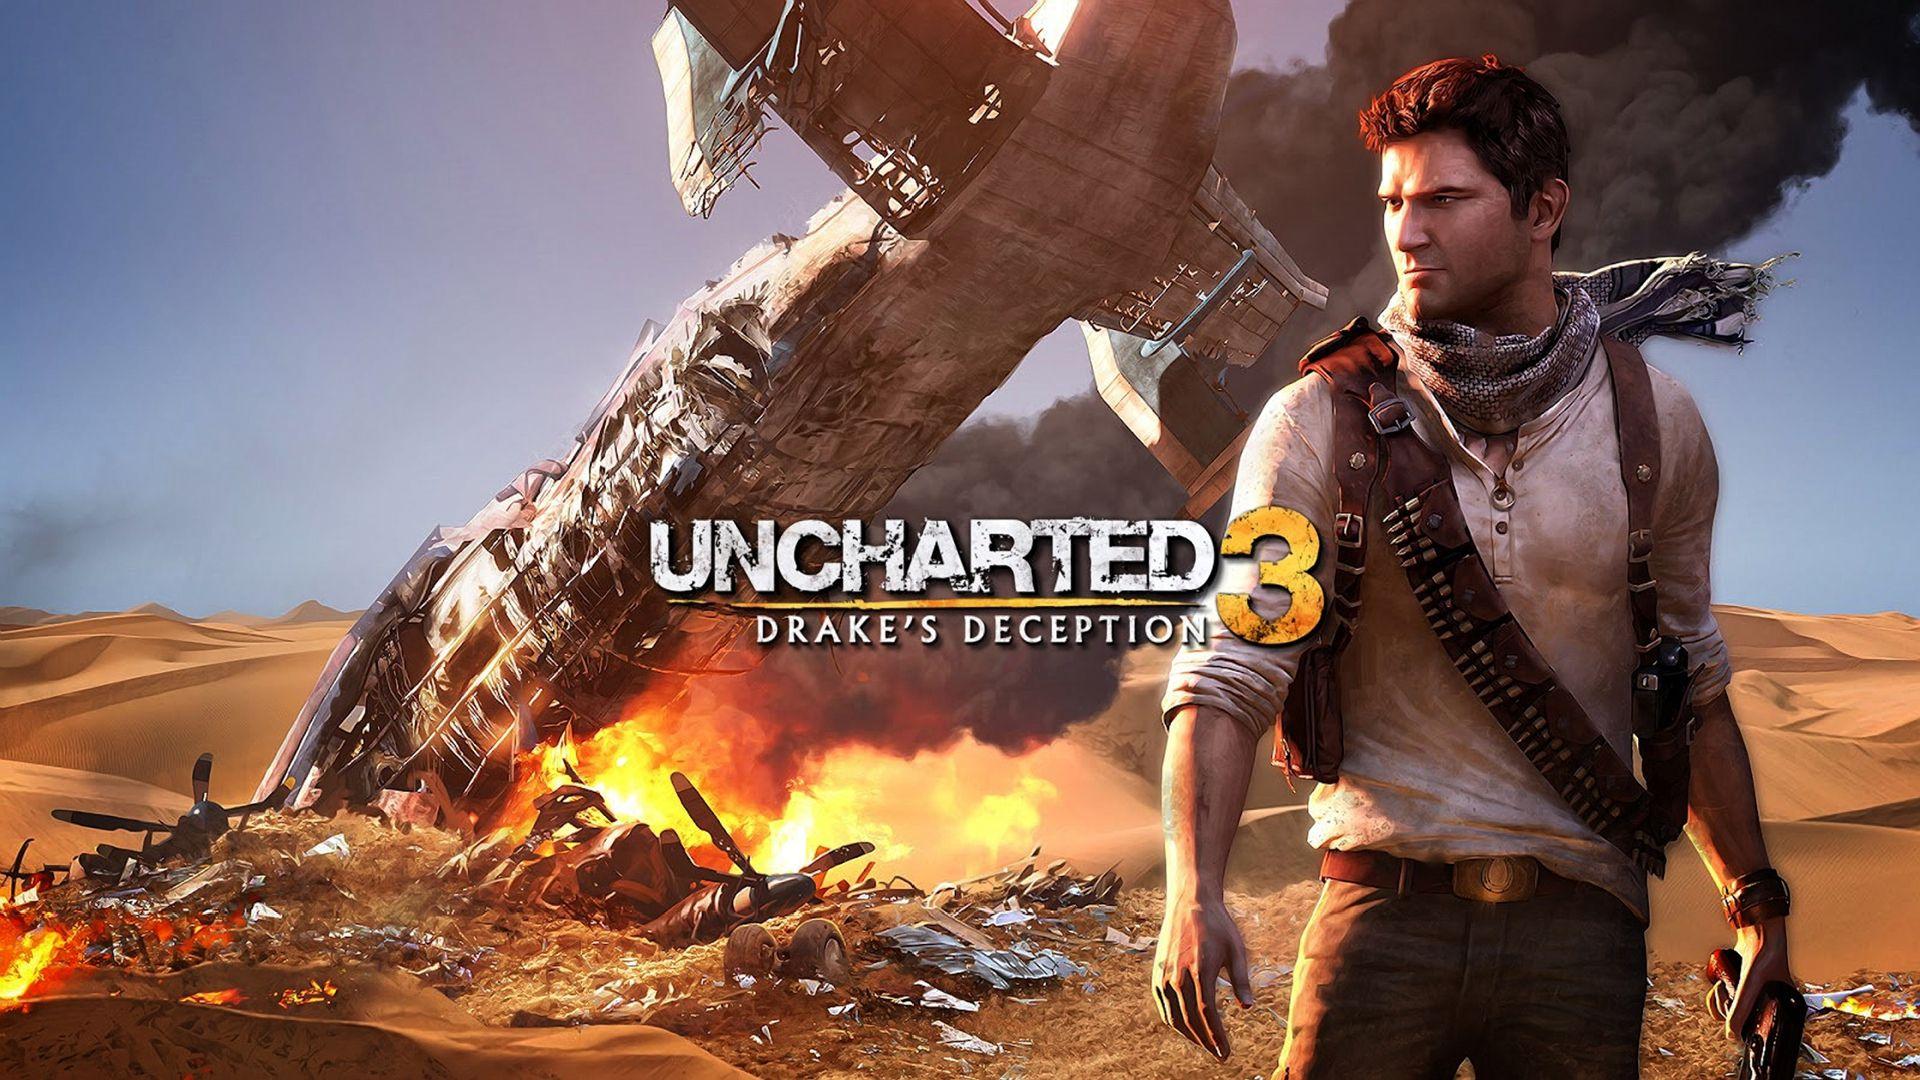 Uncharted 3 Drake's Deception [PS3] İnceleme | CoDTurkiye.NET